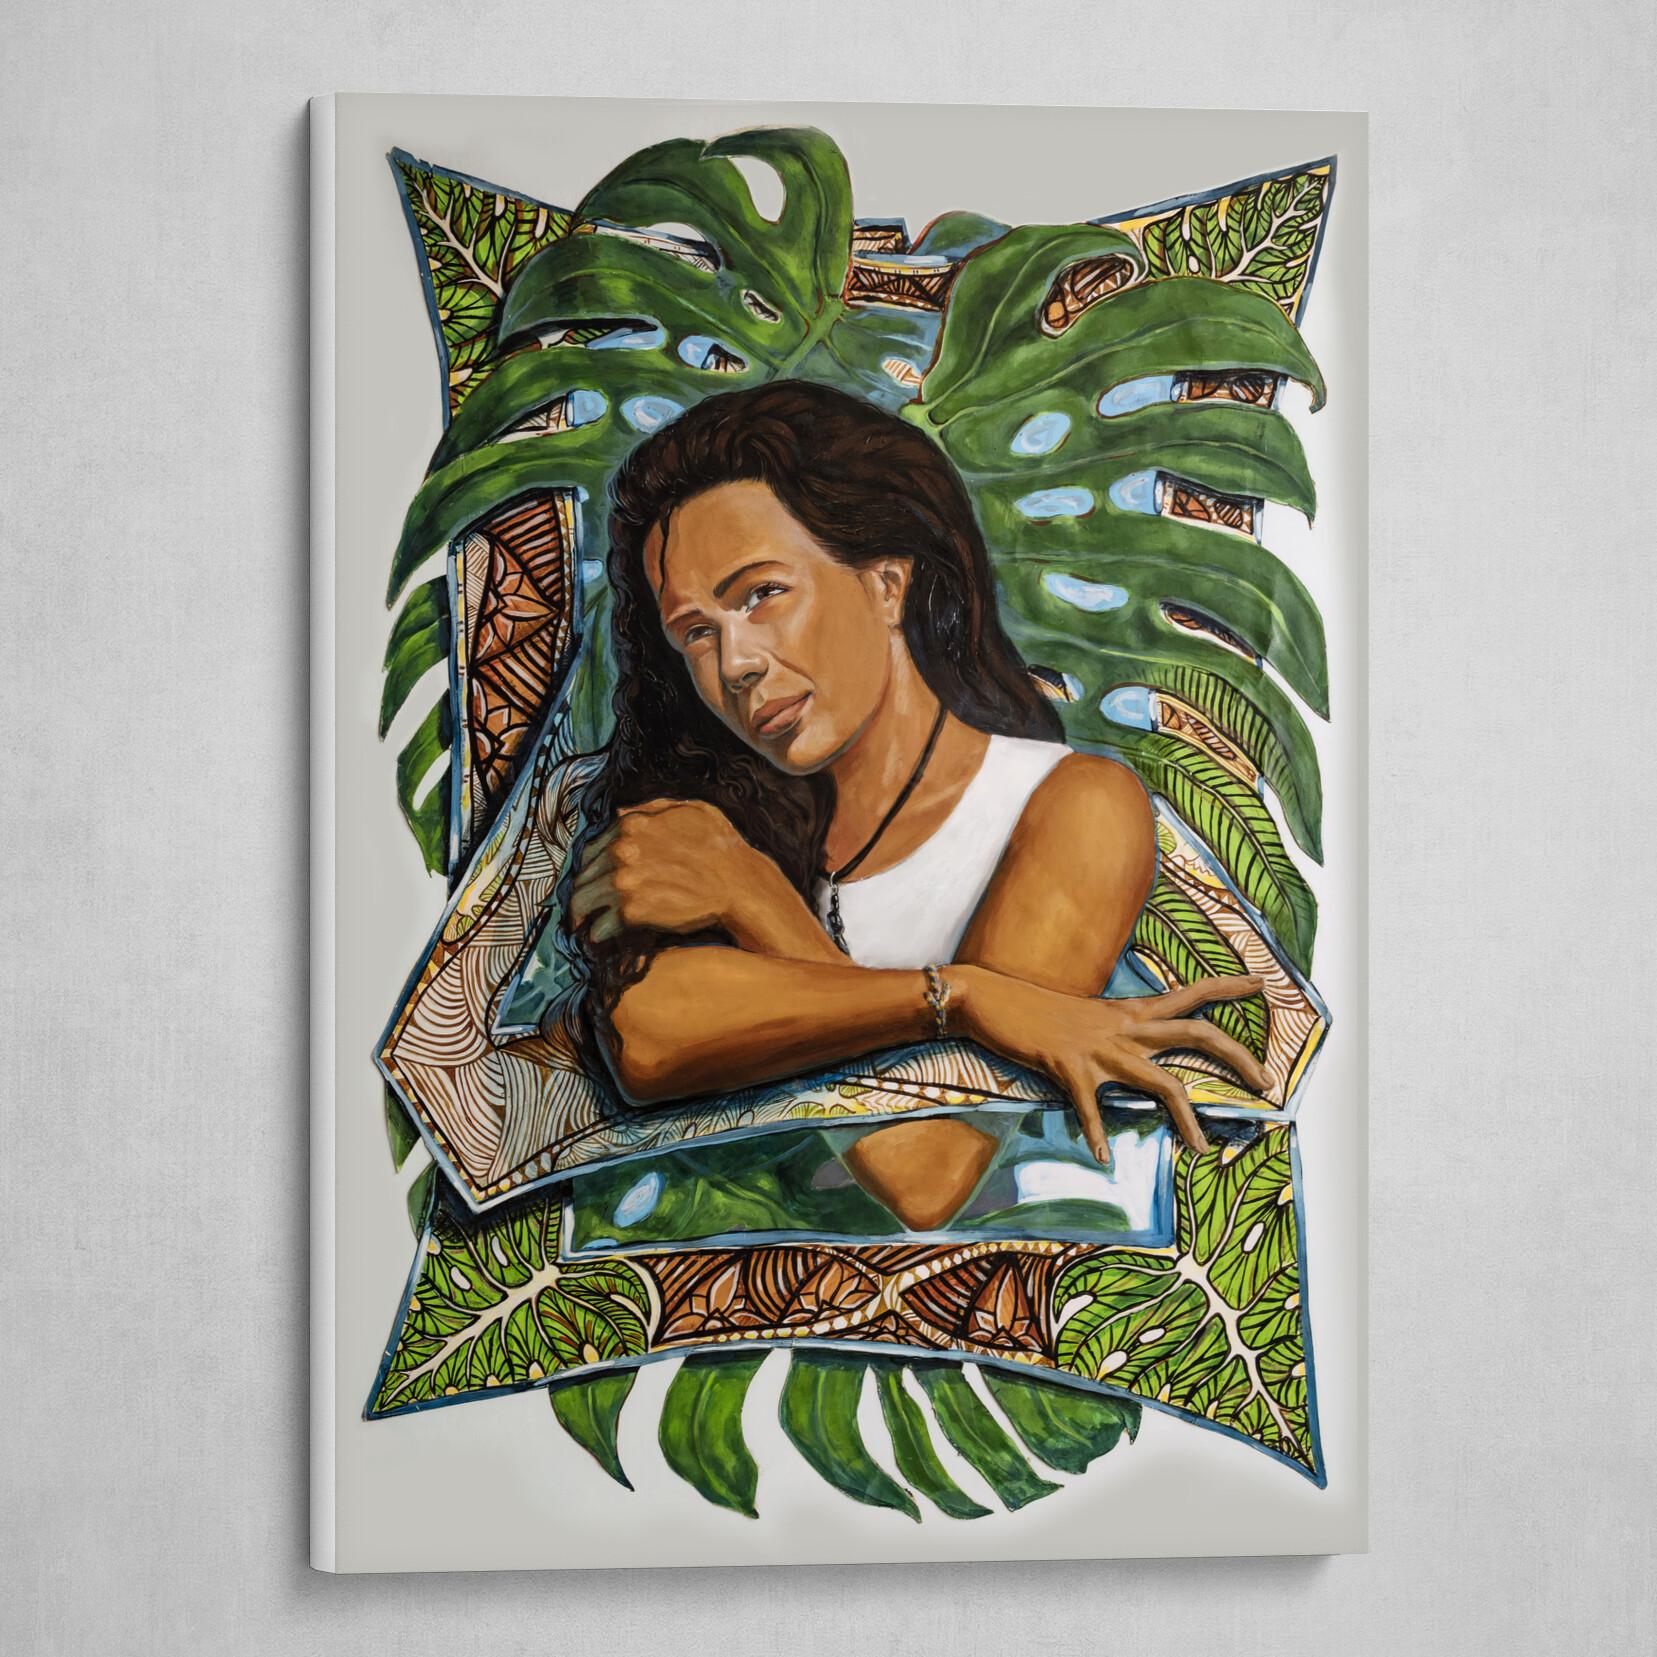 Polynesian Girl with Plant